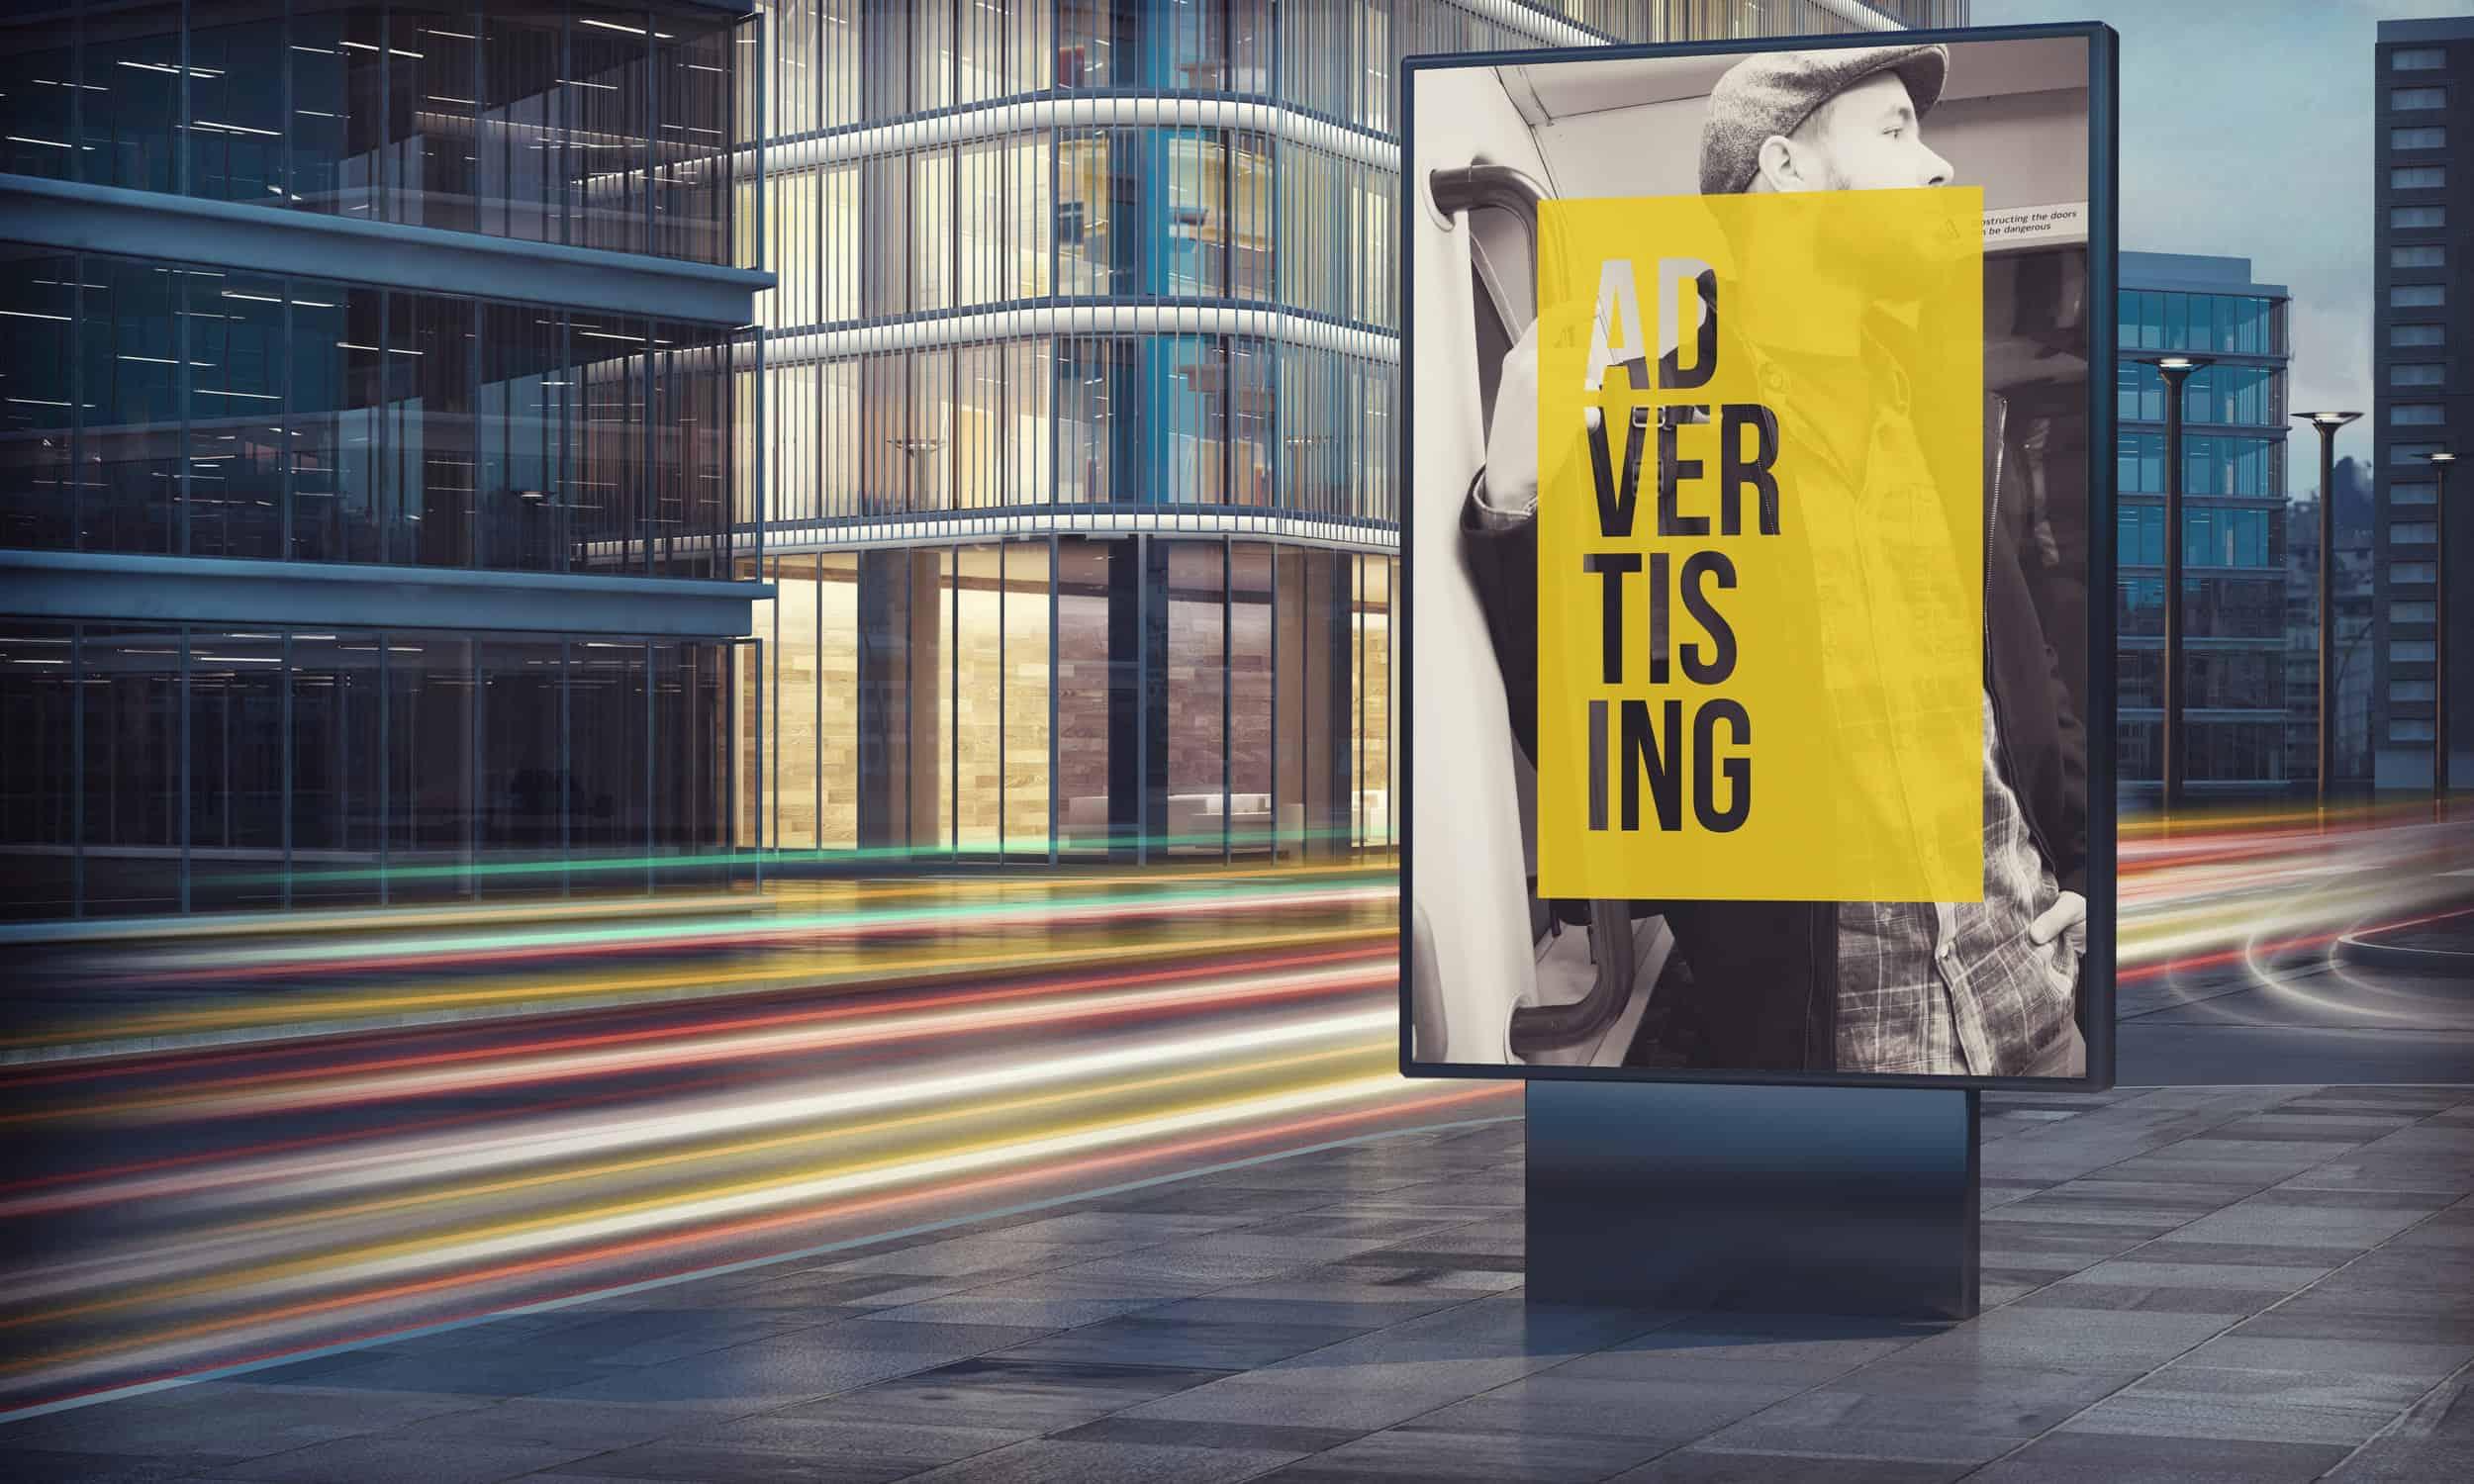 Advertising billboard in city night